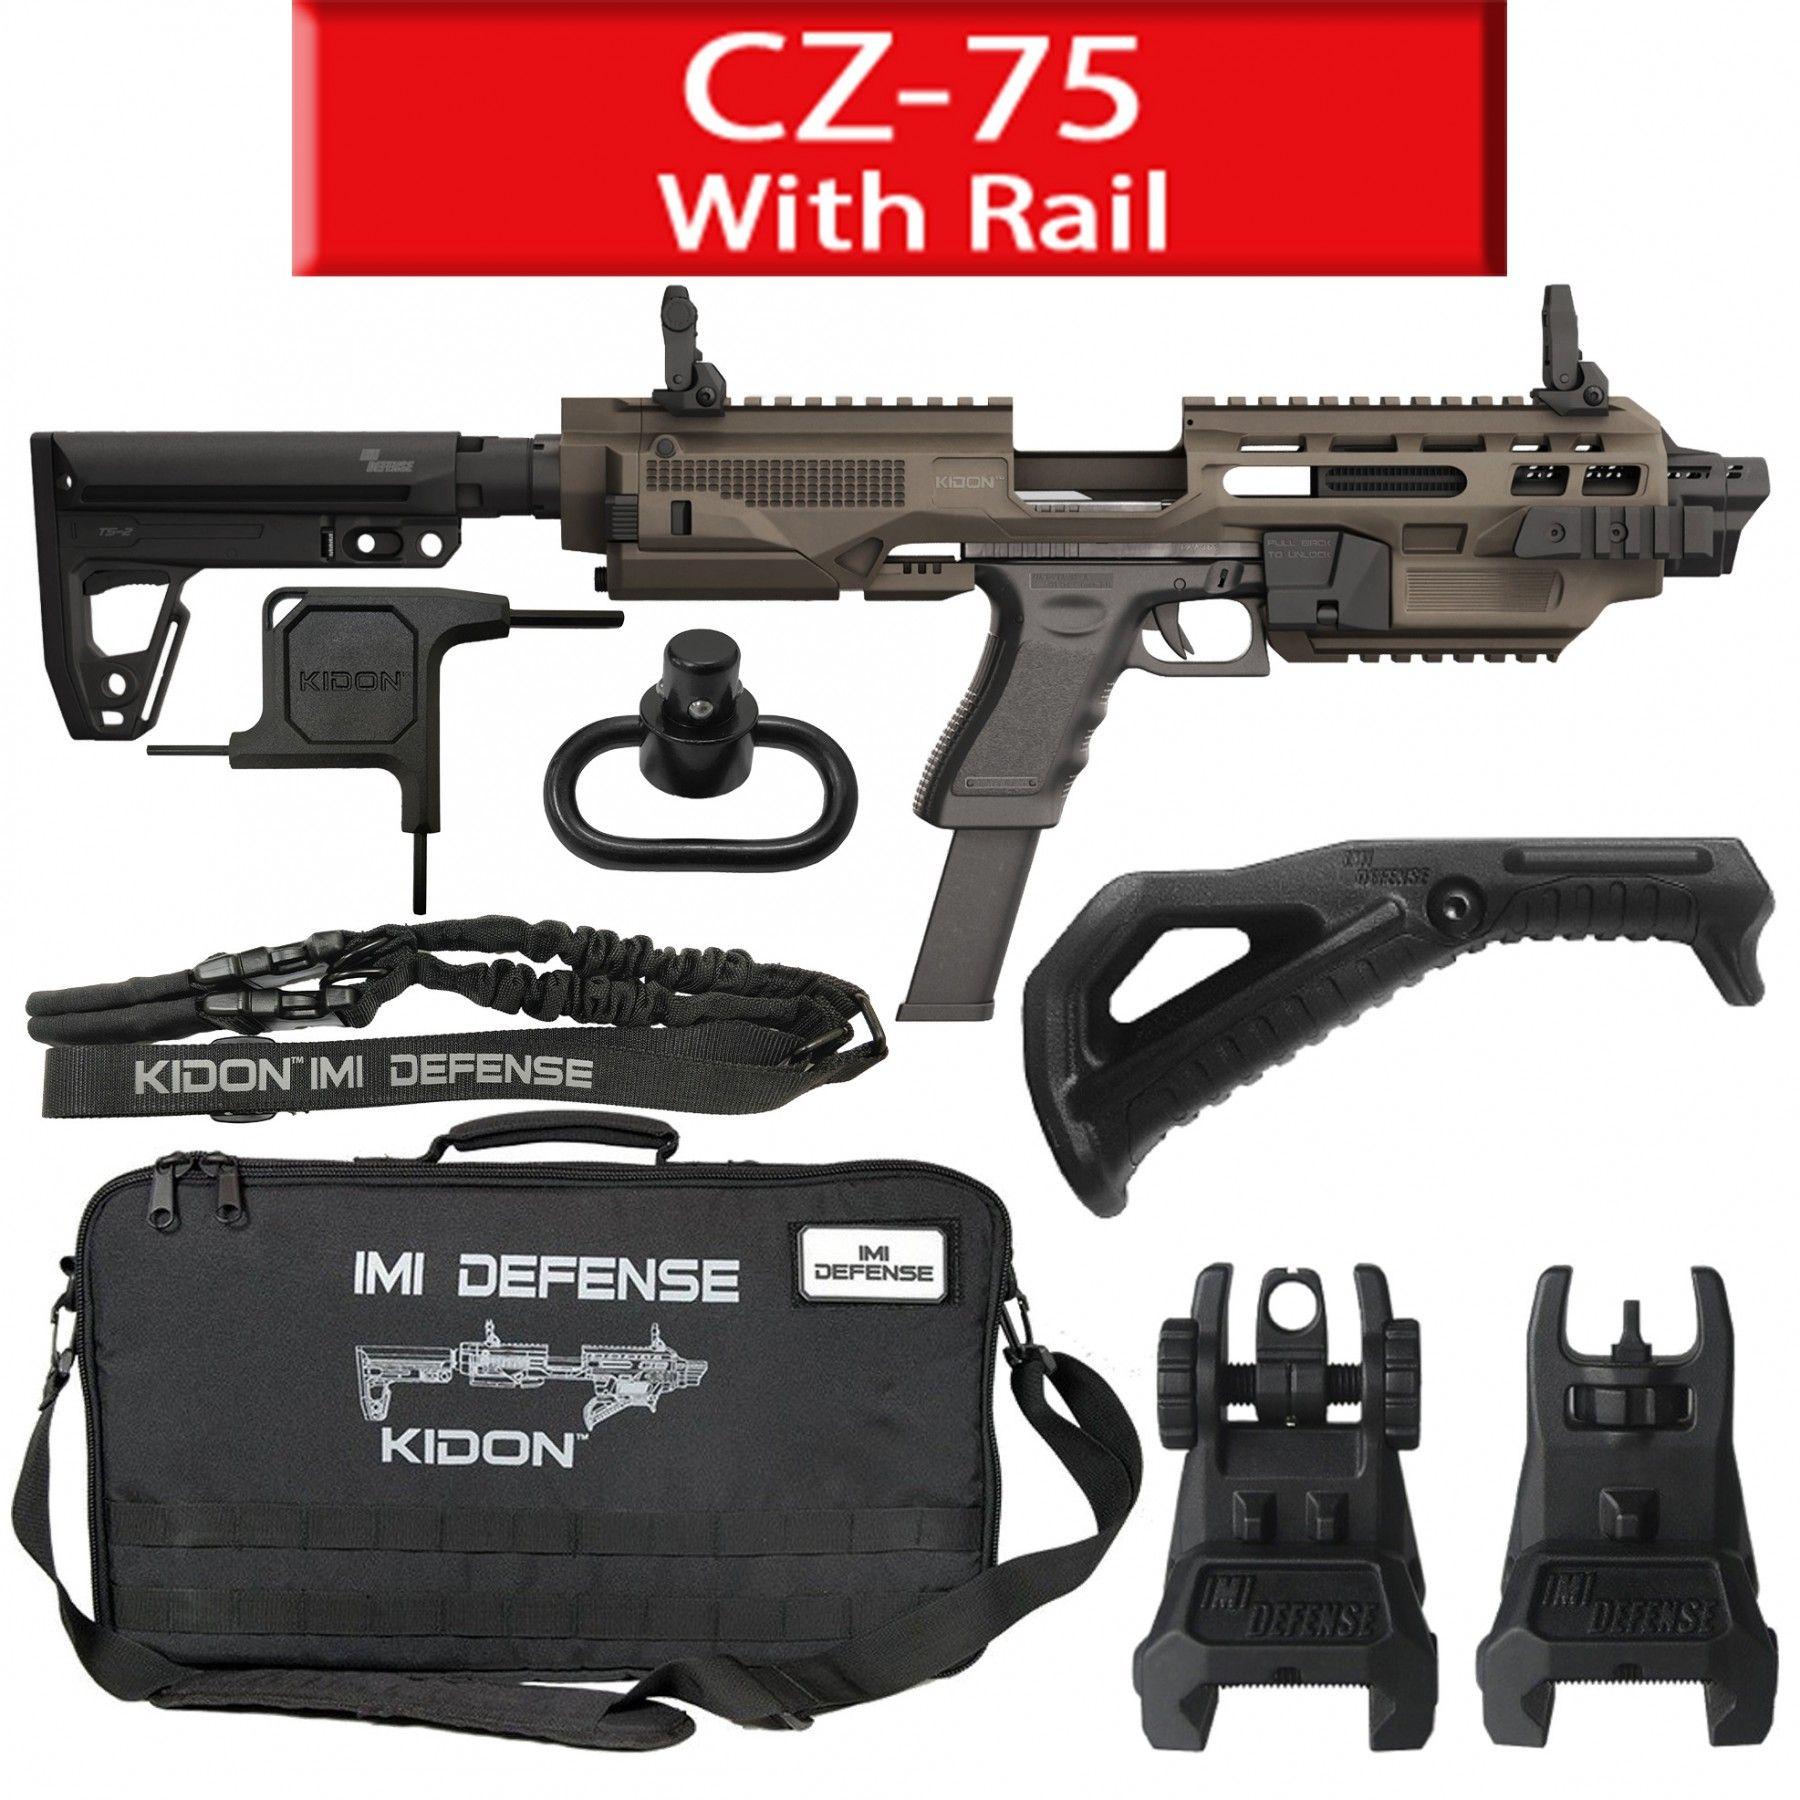 IMI Defense KIDON Iinnovative Pistol to Carbine Platform for